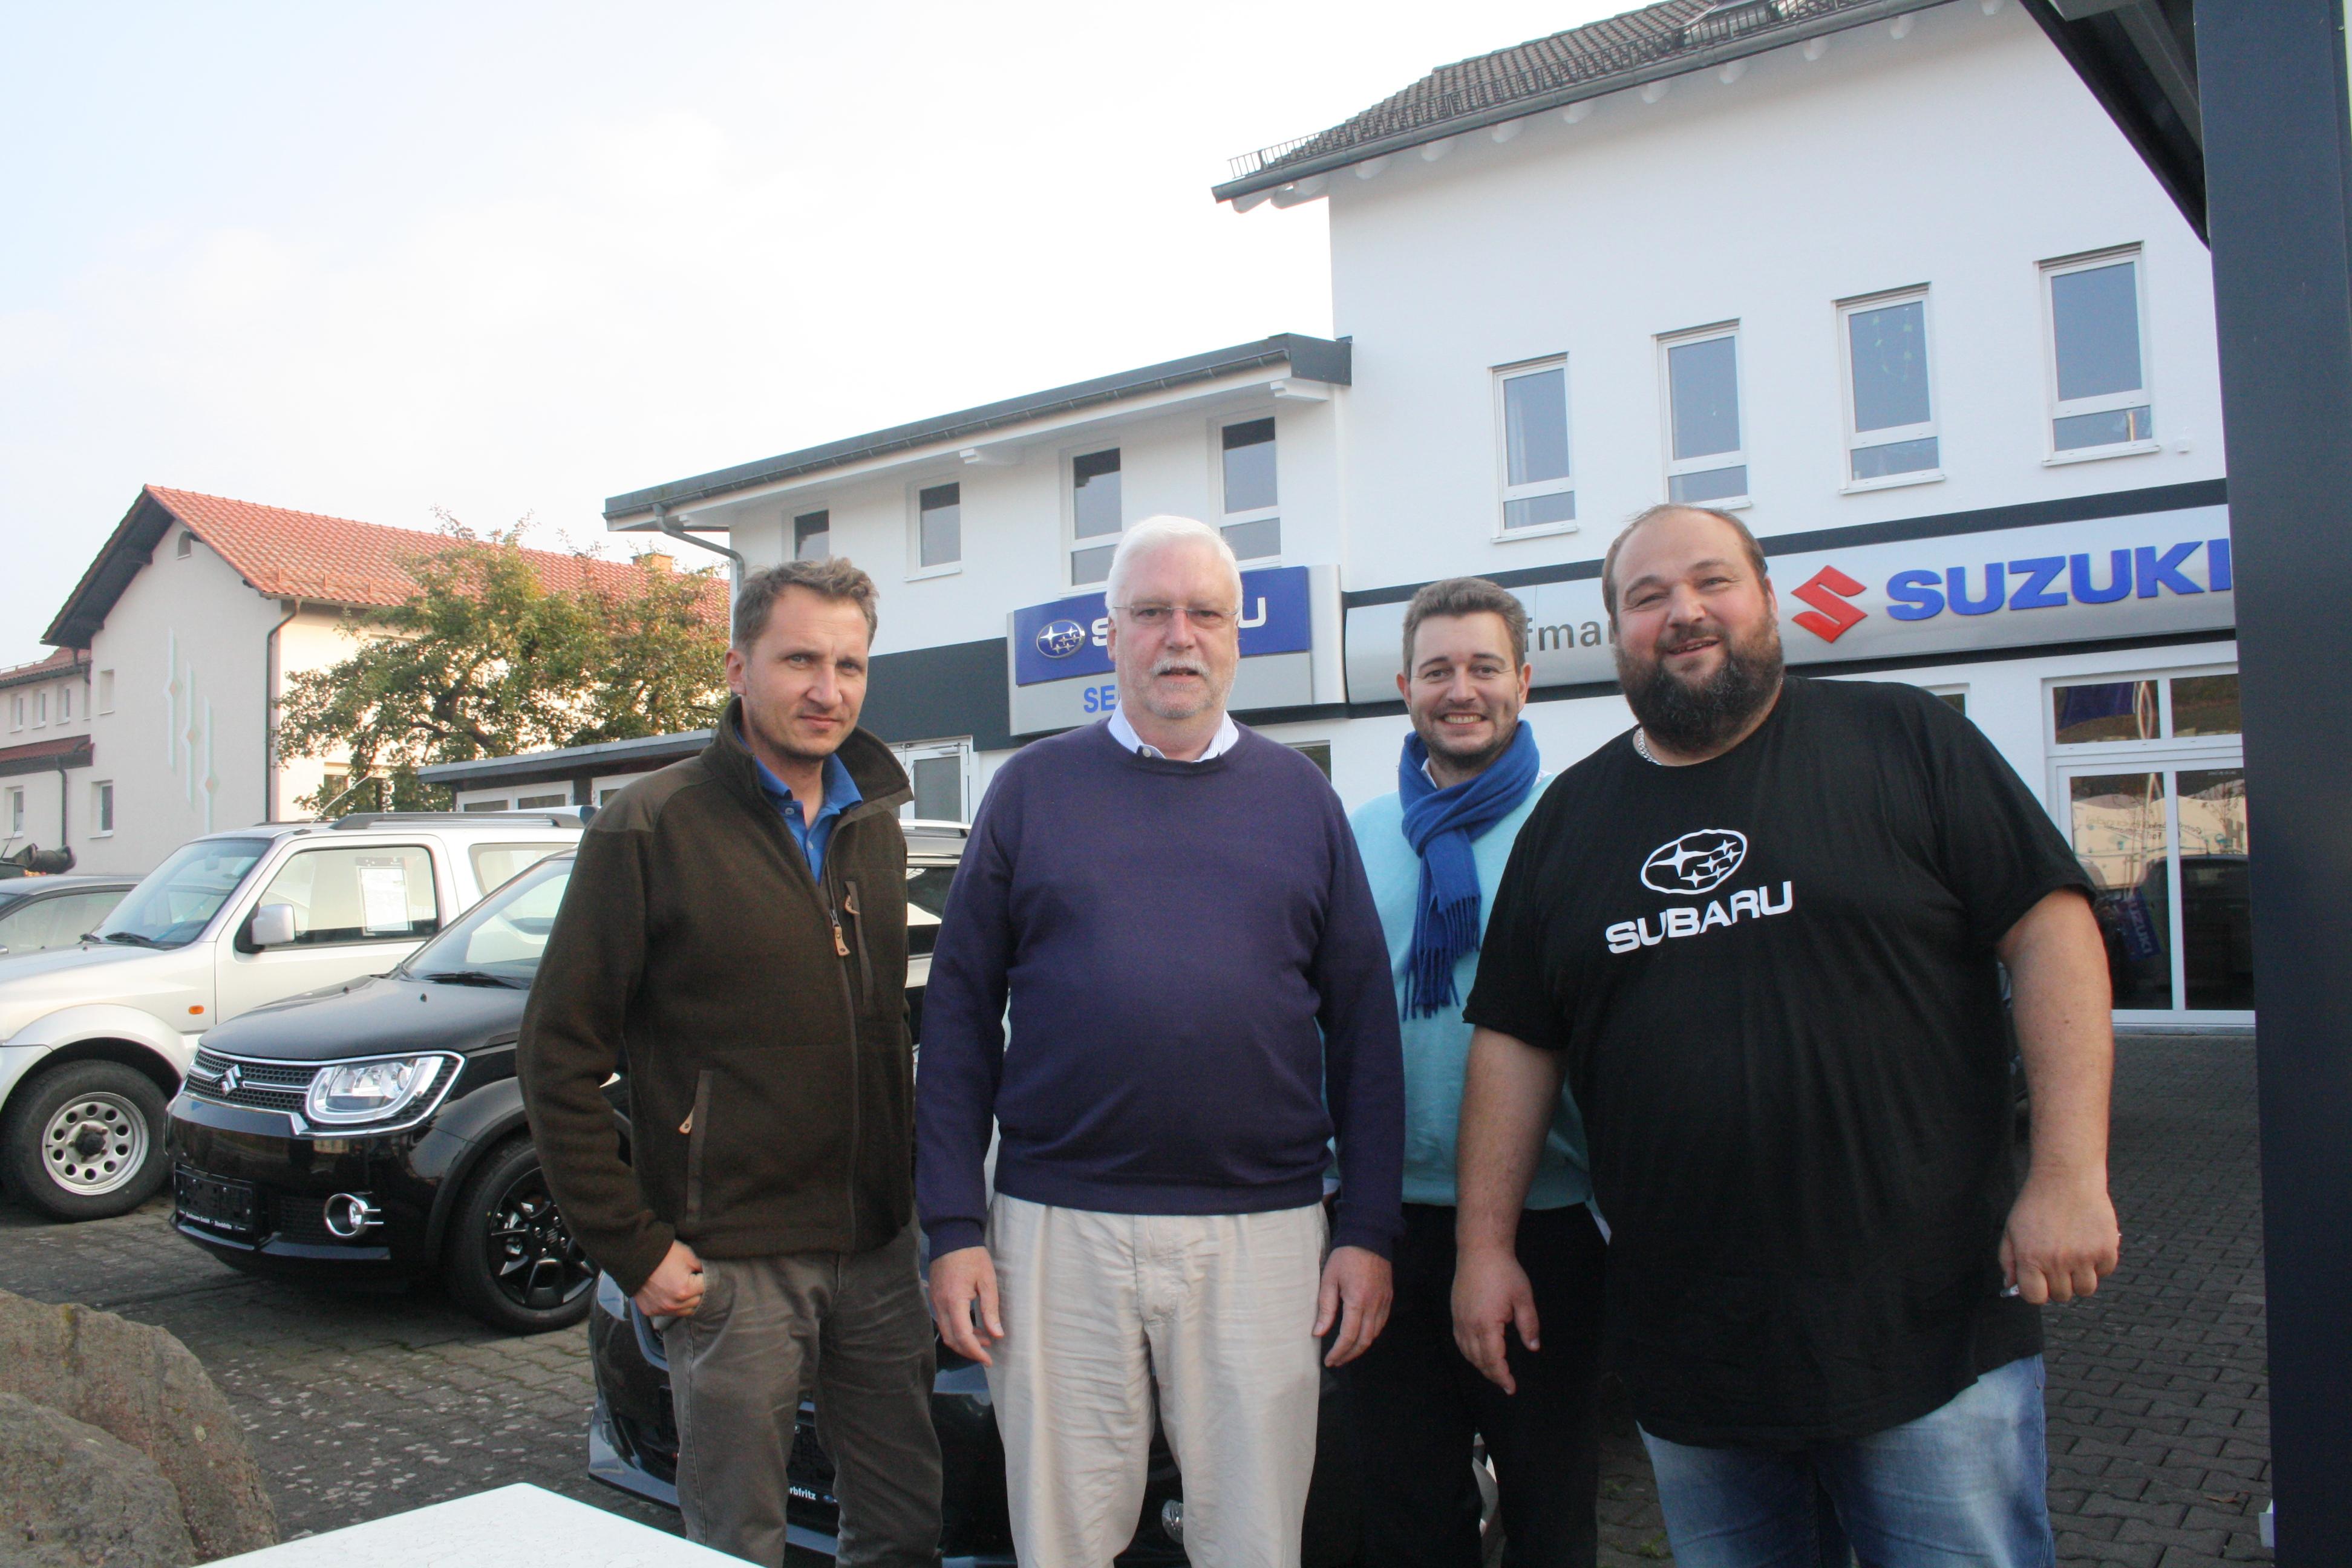 vlnr Alexander H. Klüh, Jörg-Uwe Hahn, Daniel Protzmann und Jan Kaufmann